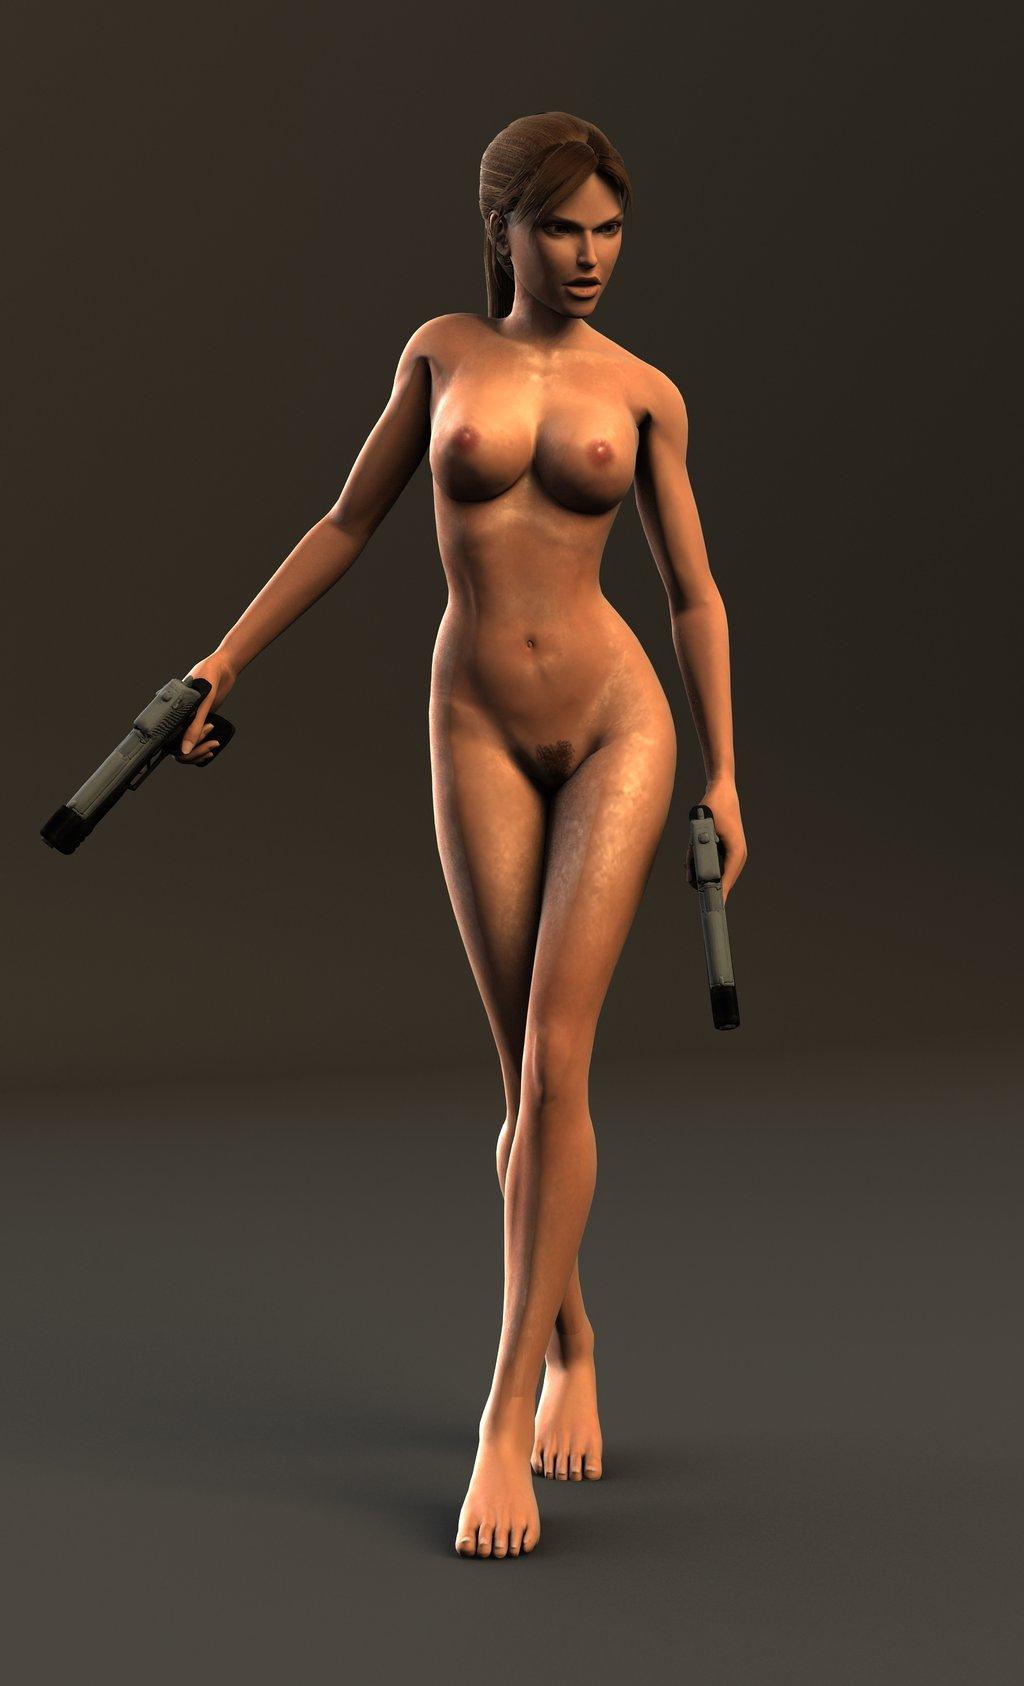 Lara croft nude pics & vids fucks pictures